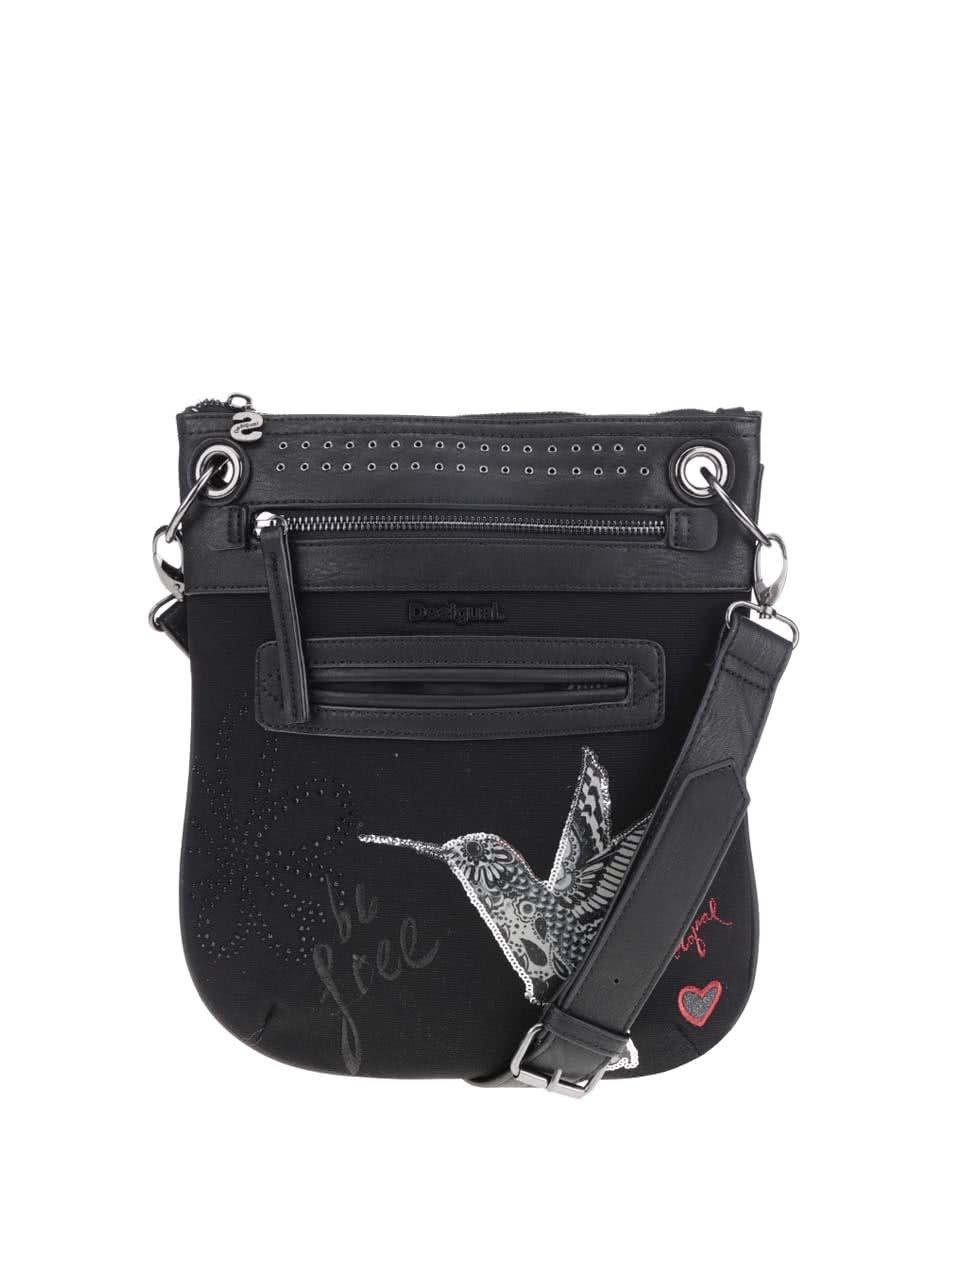 Černá crossbody kabelka s potiskem Desigual Bandolera Black Bird